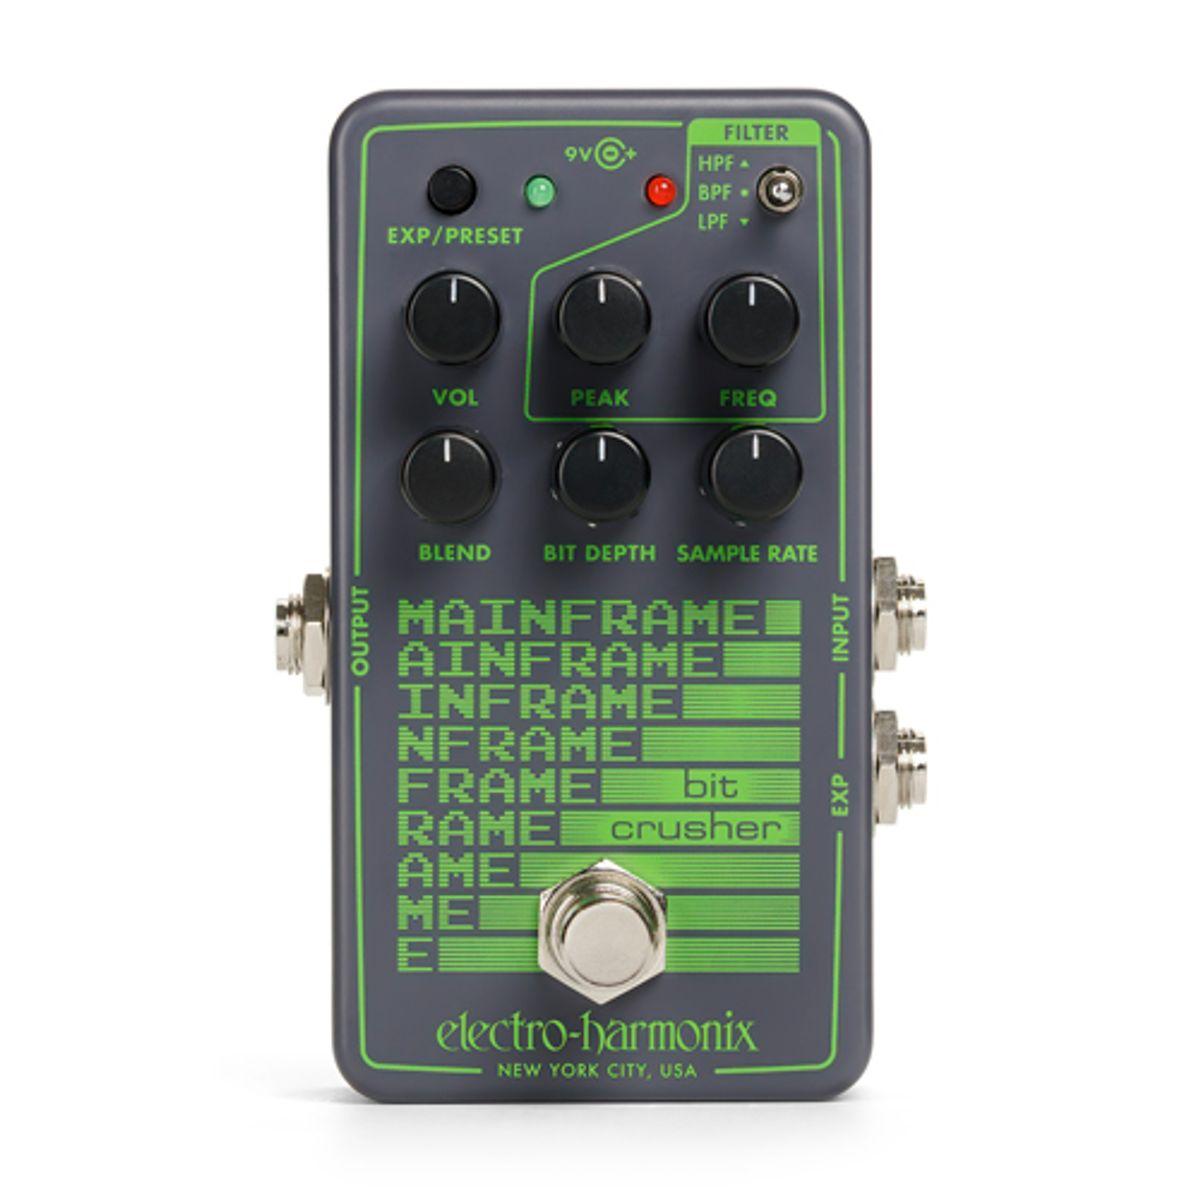 Electro-Harmonix Announces the Mainframe